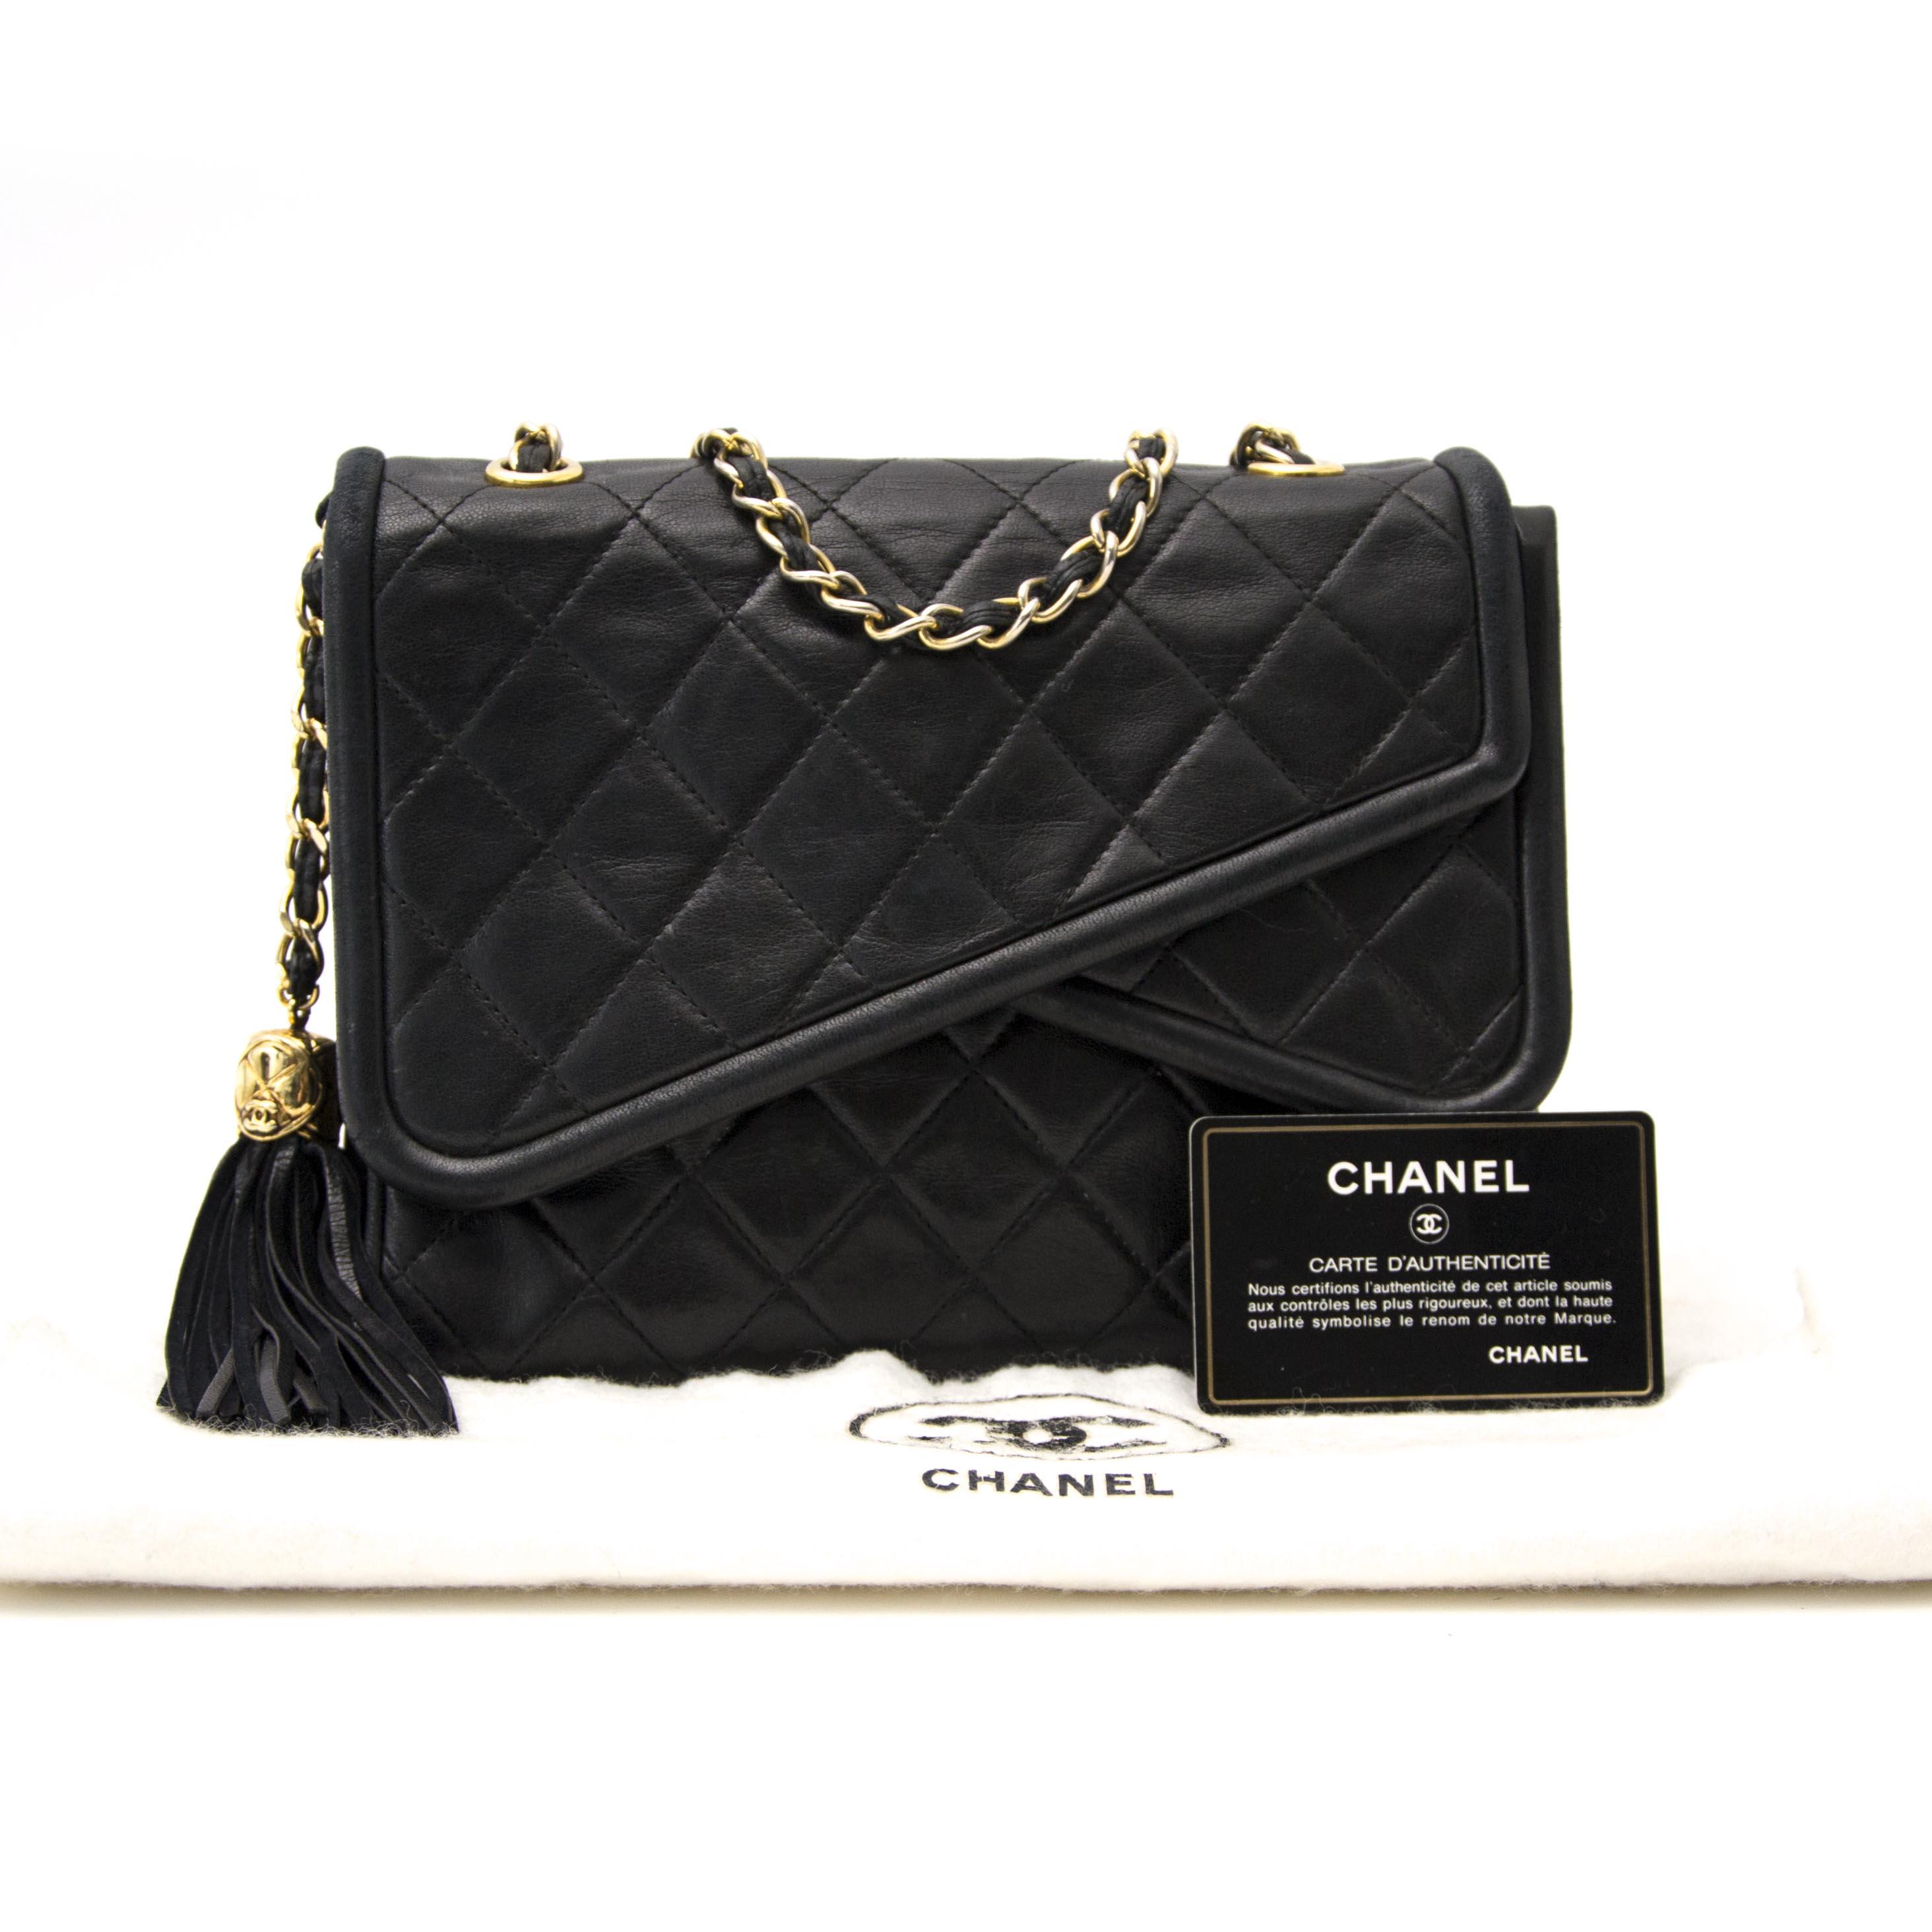 3c44d0eb7584 shop safe online your seocndhand Chanel Vintage Crossbody Bag skip the  waitinglist shop your sChanel Vintage Crossbody Bag online at the best price